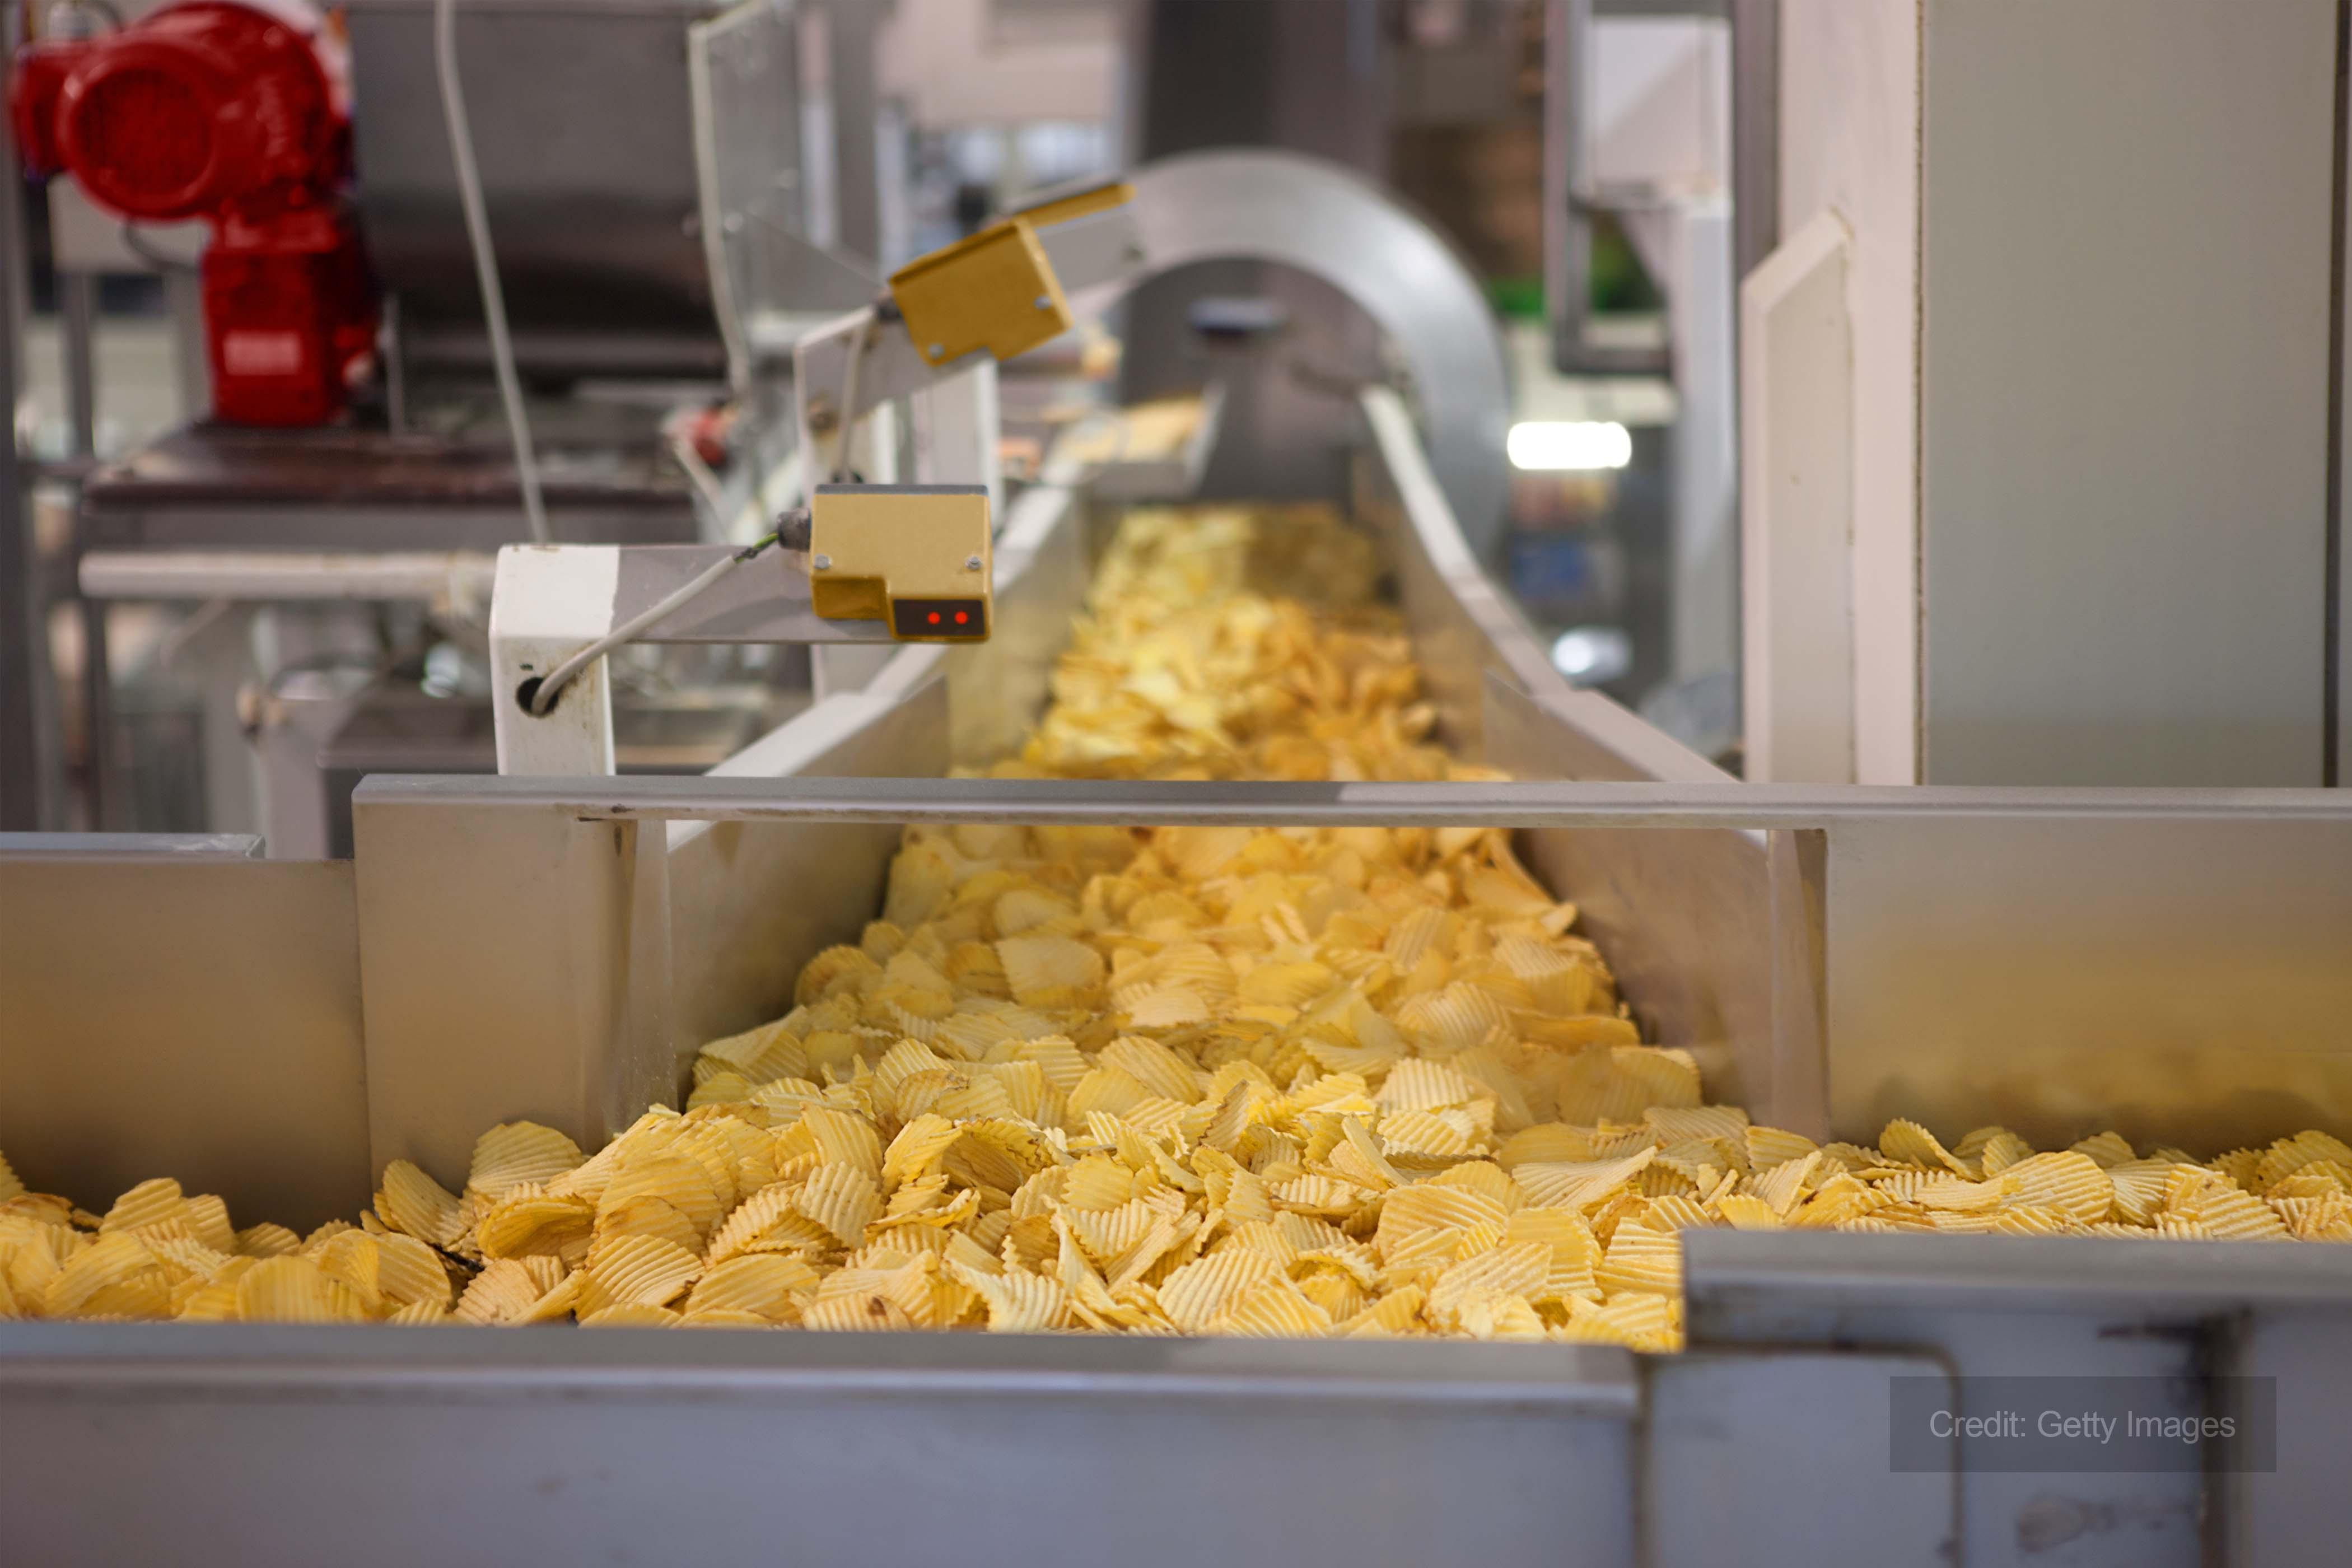 Staff cooled for snack manufacturer